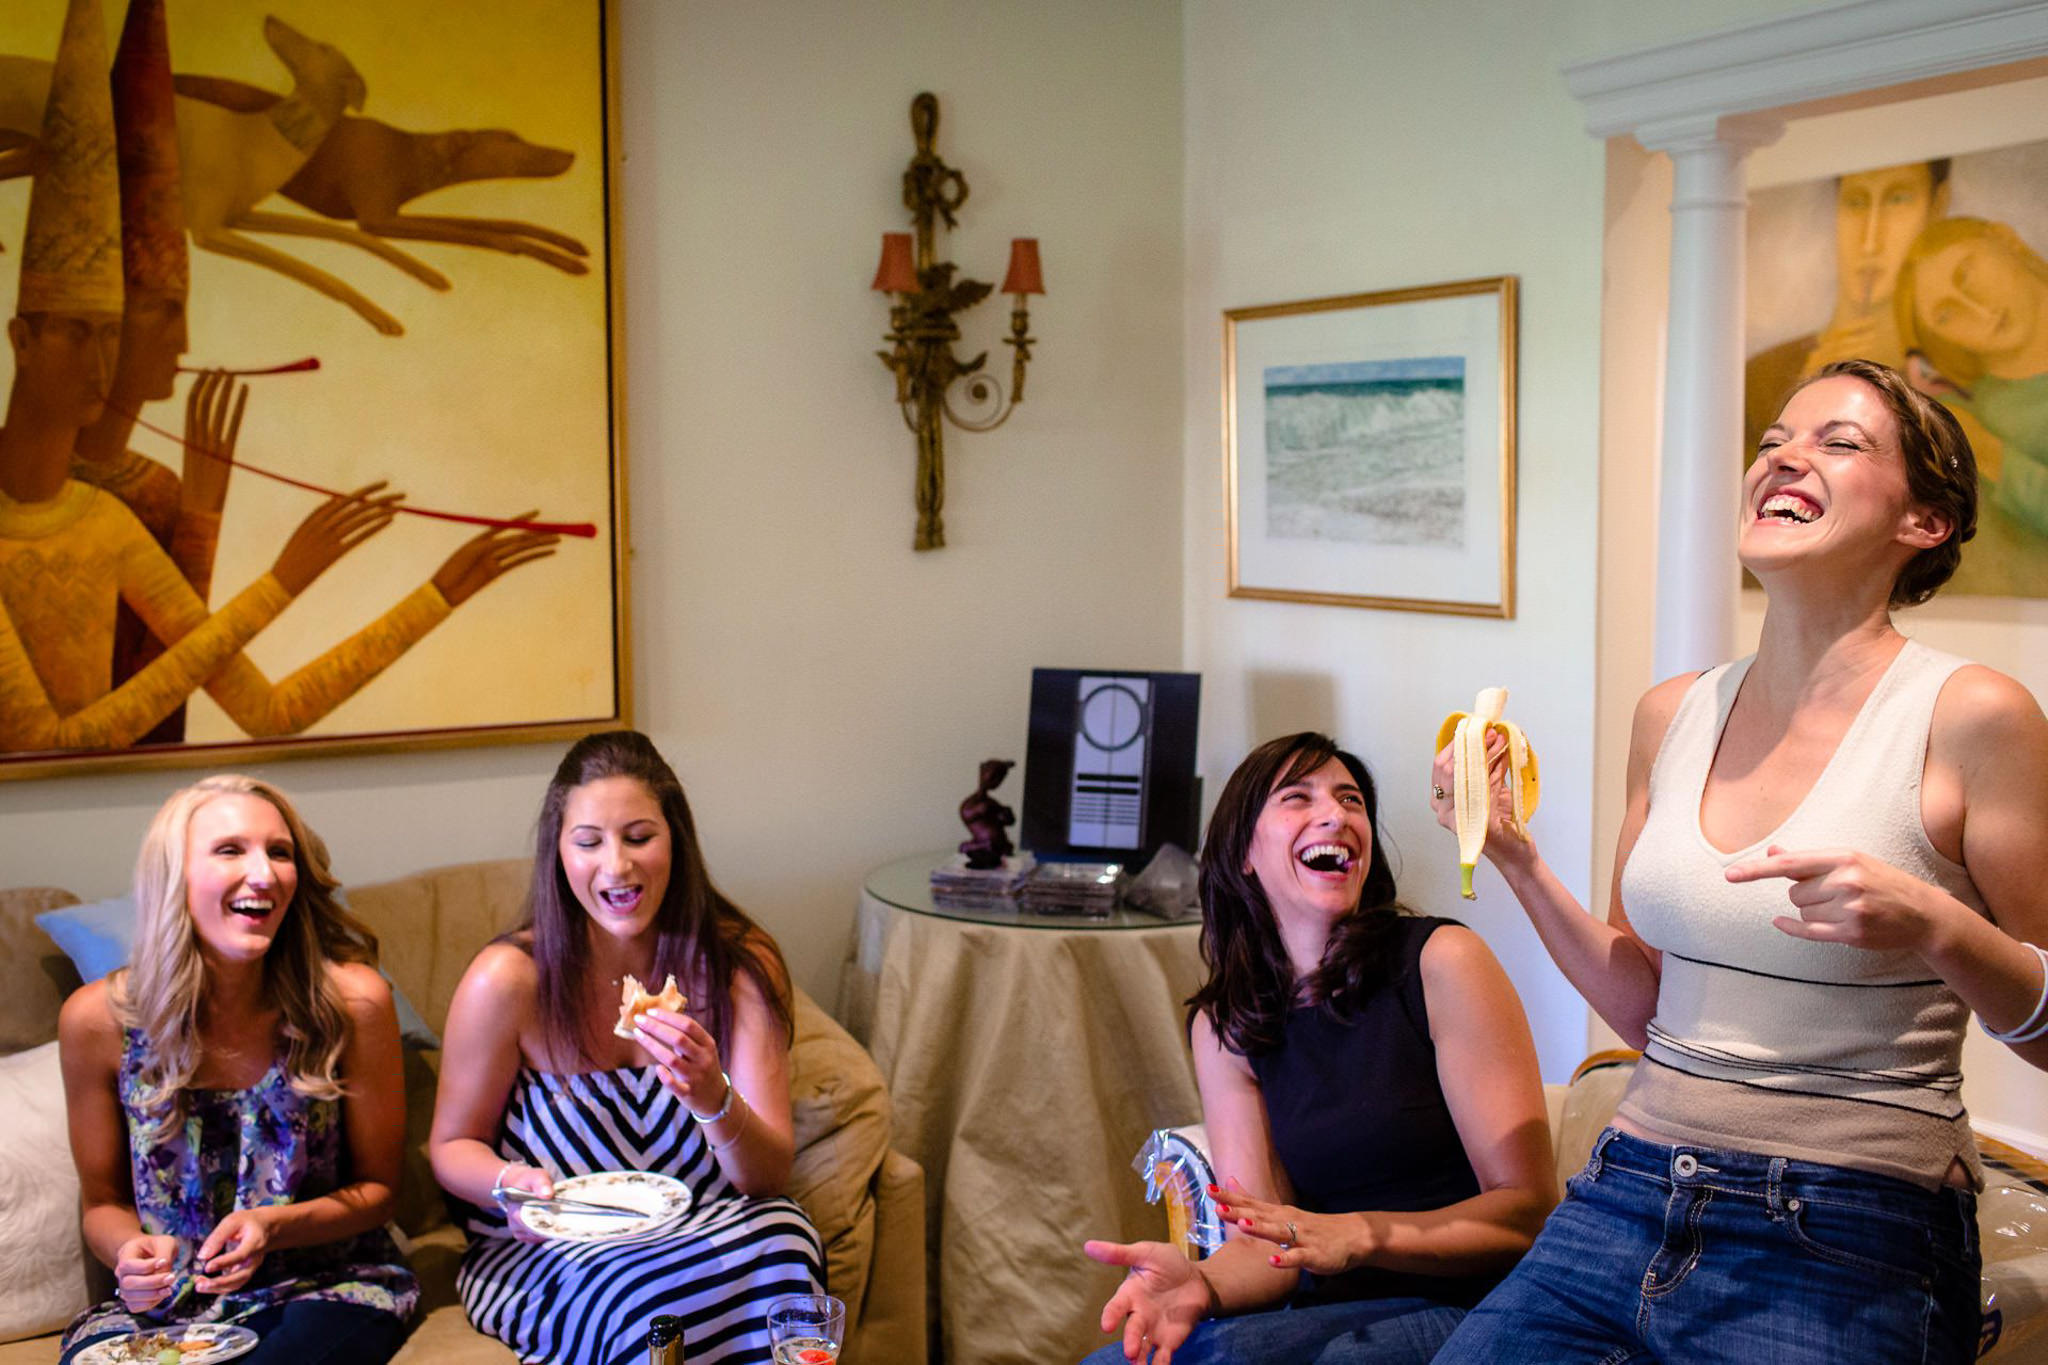 St. Pancras Renaissance hotel wedding bridesmaids laughing